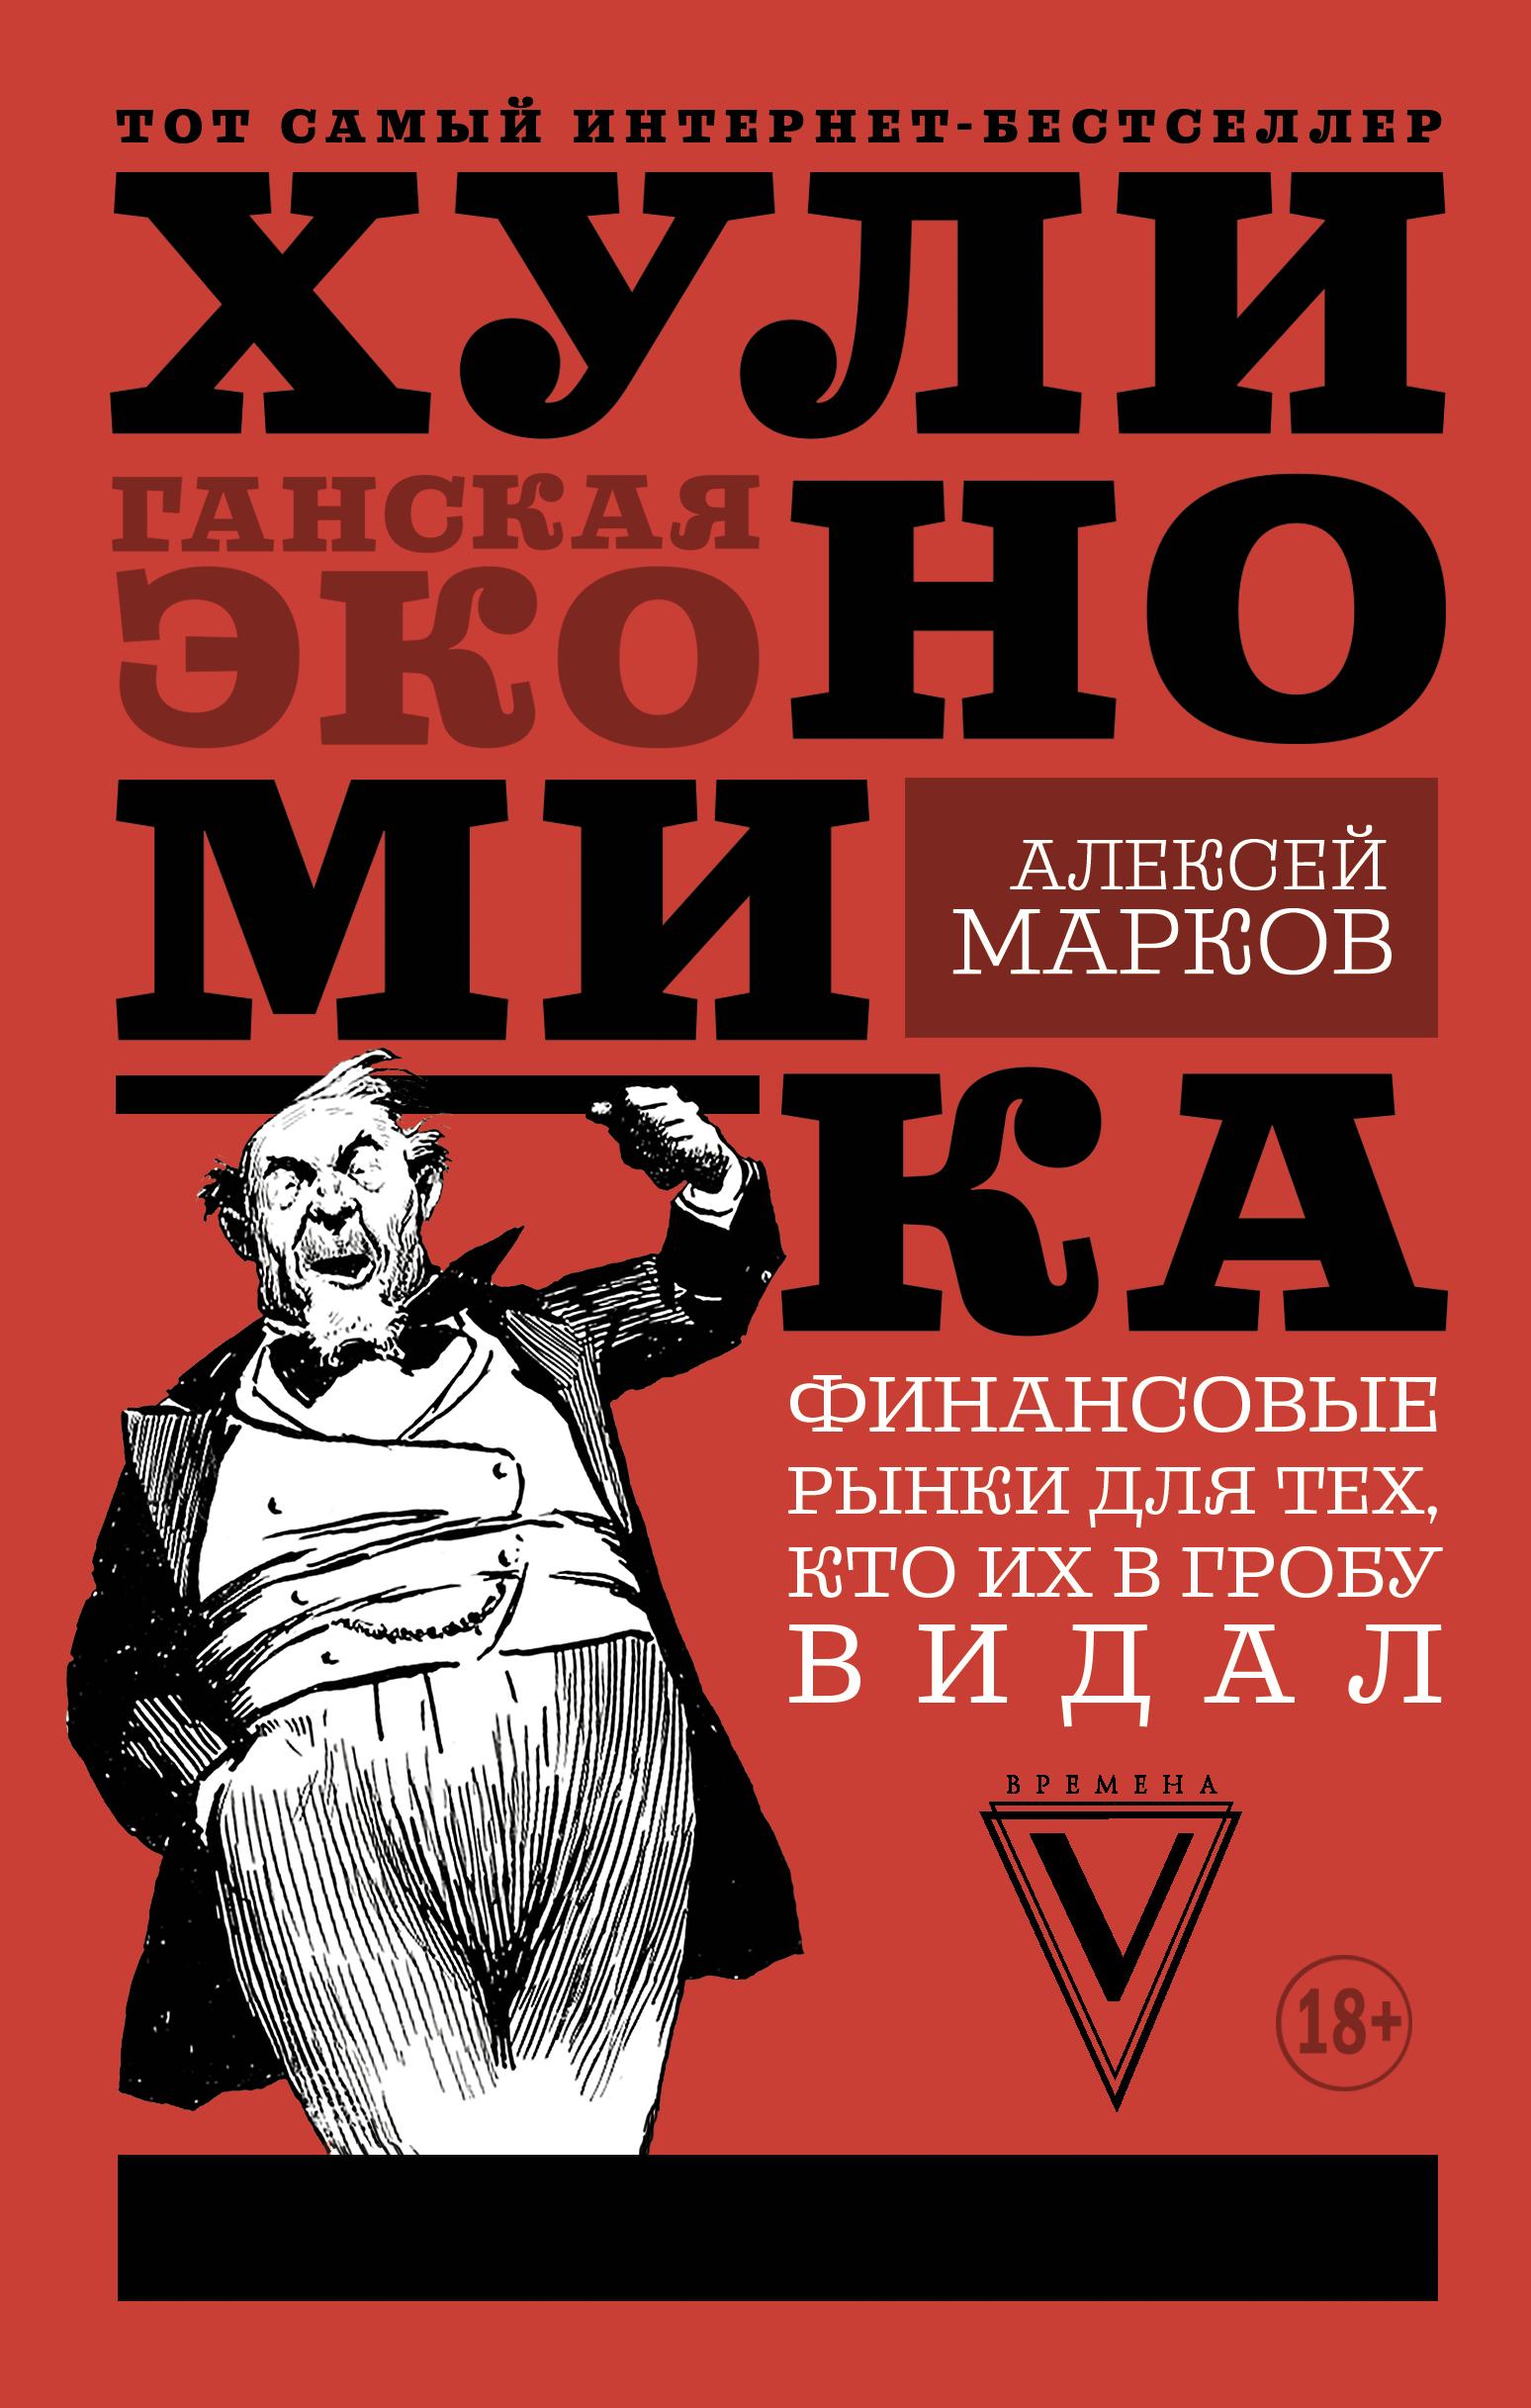 Хулиномика: хулиганская экономика от book24.ru